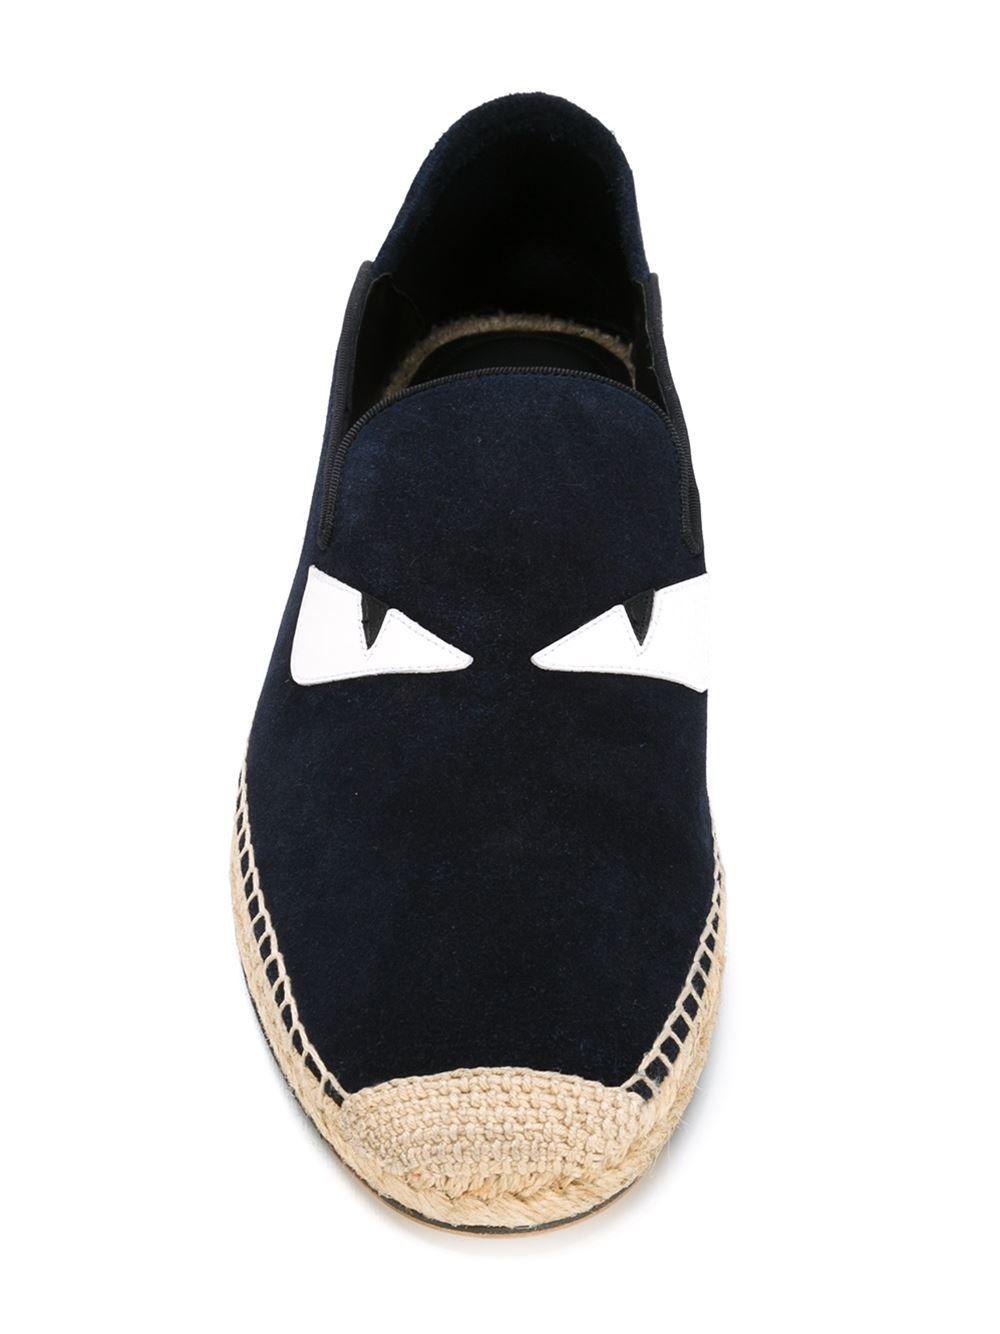 fendi  shoes  bagbugs  navy  espadrilles  men  fashion www.jofre.eu ... 4e5a268147e